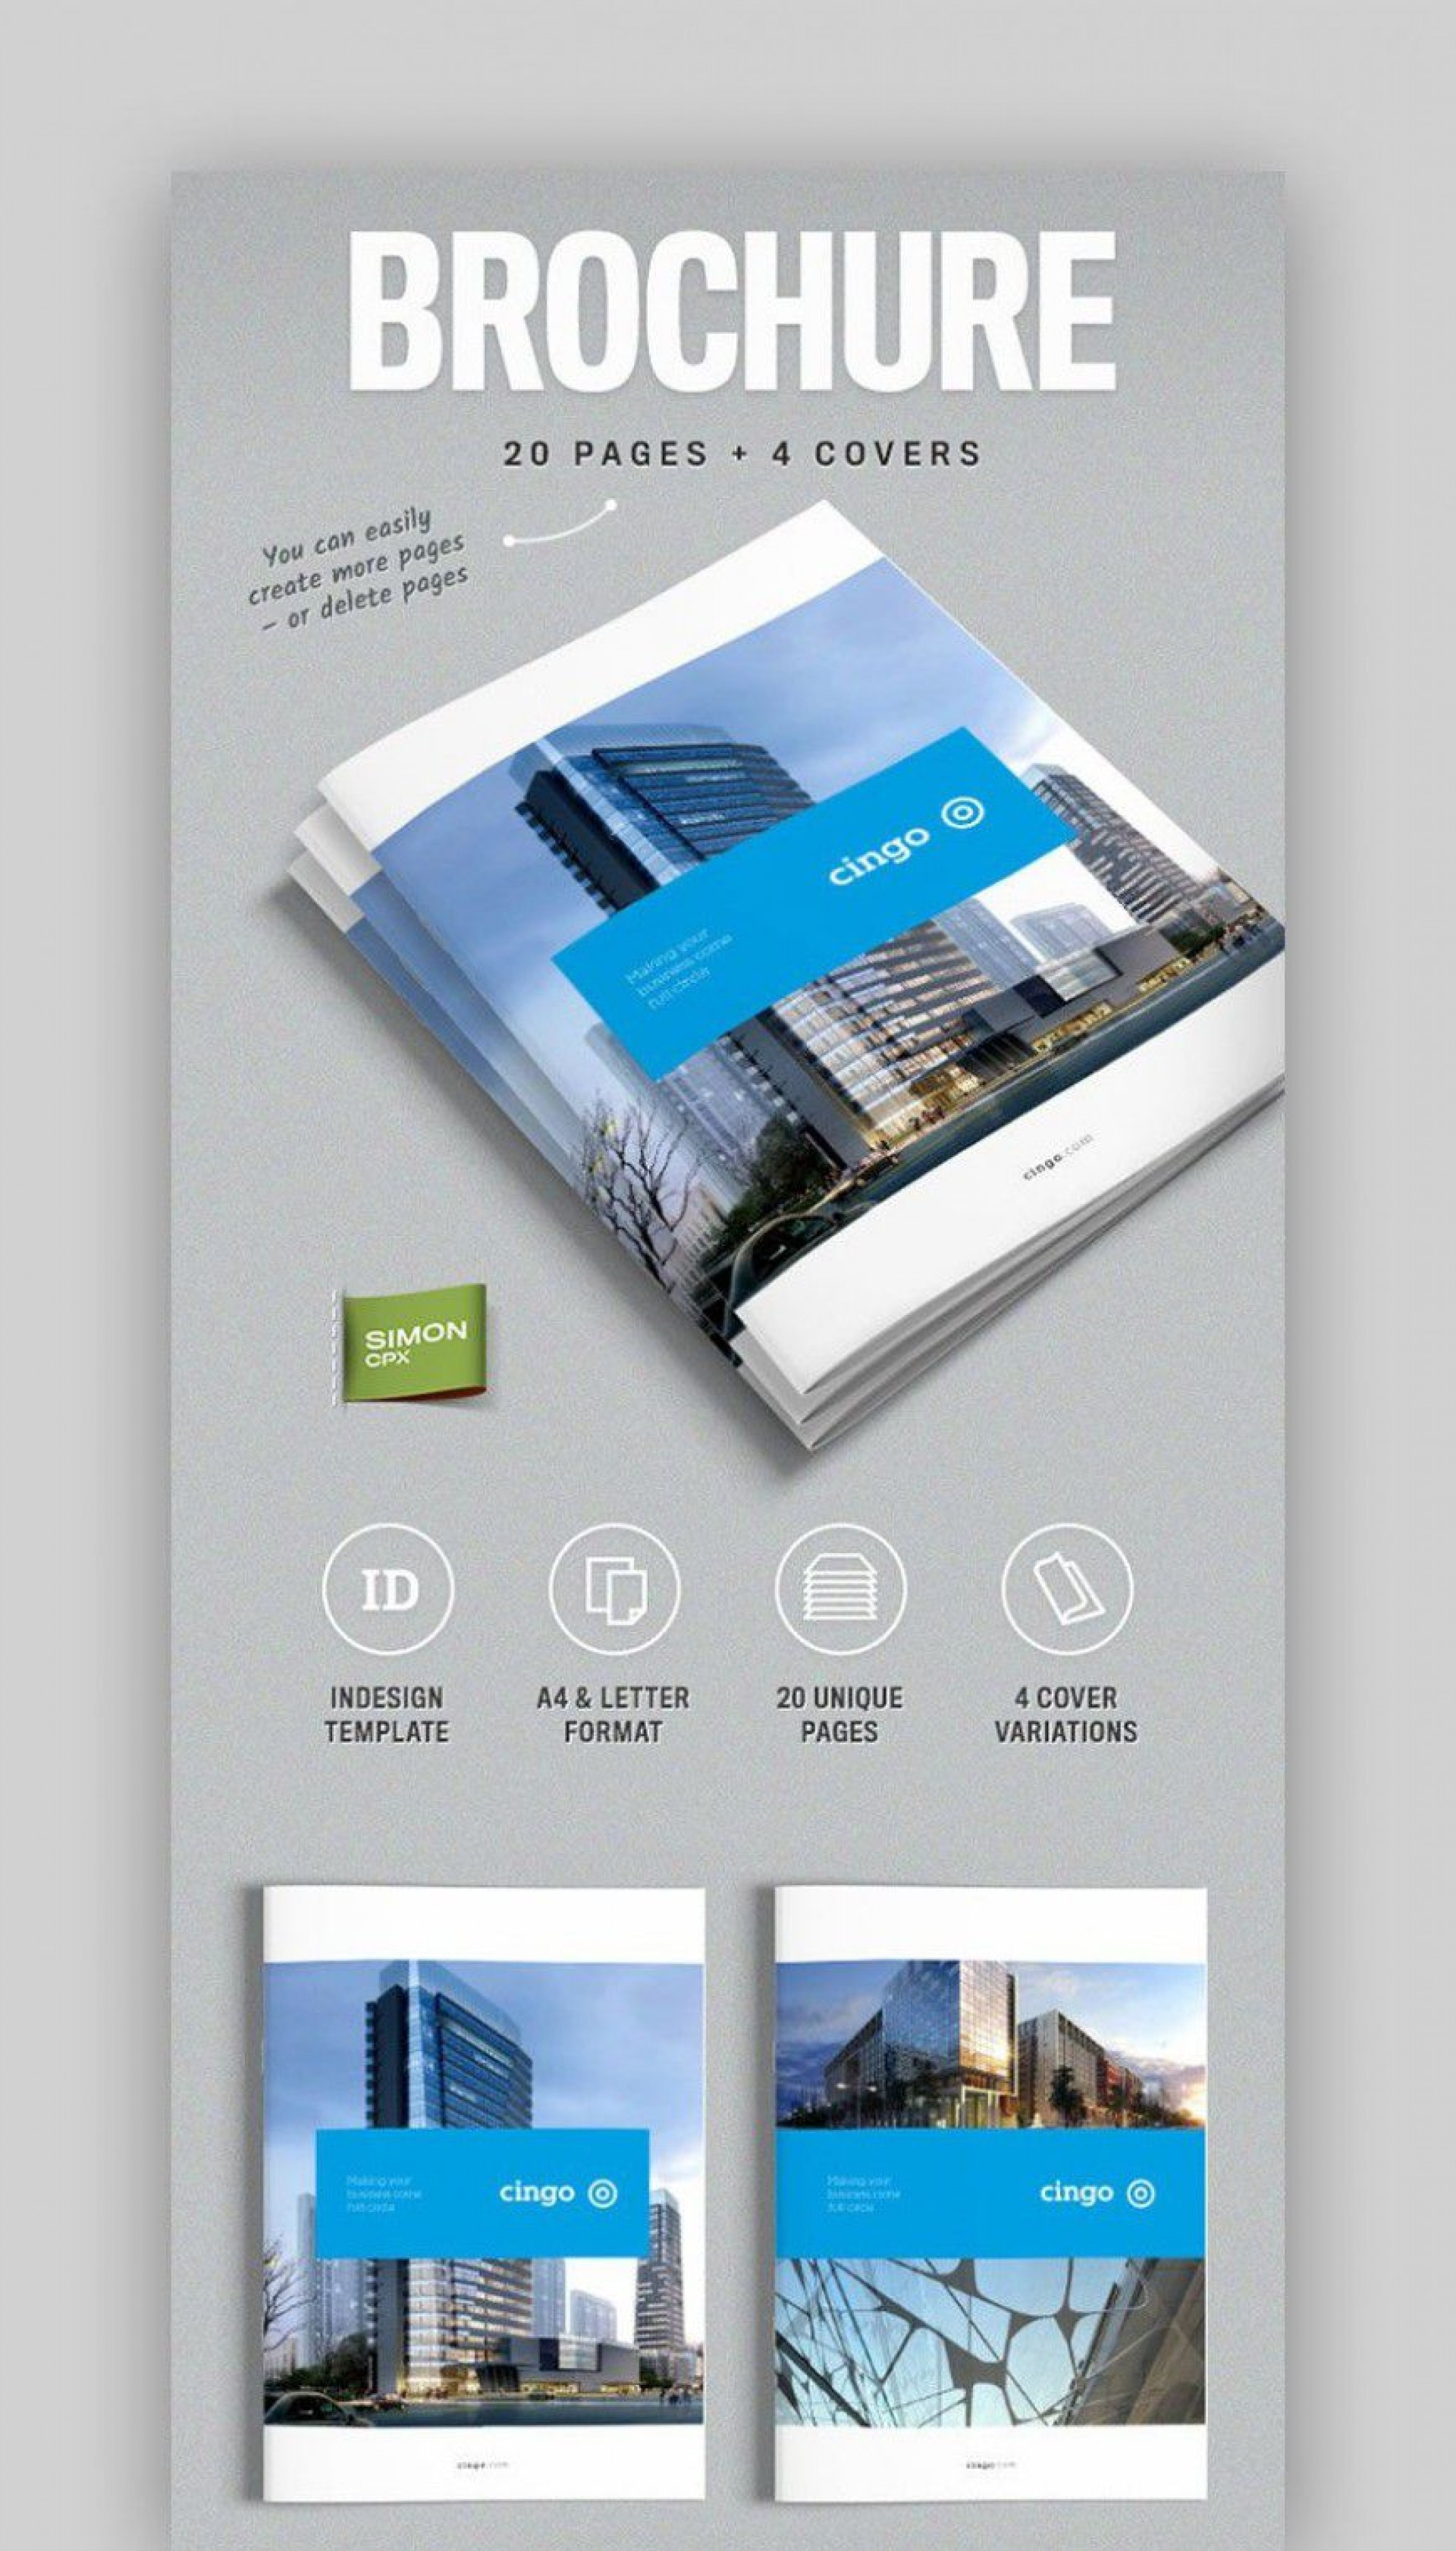 000 Unbelievable Adobe Indesign Brochure Template Free Download Image 1920